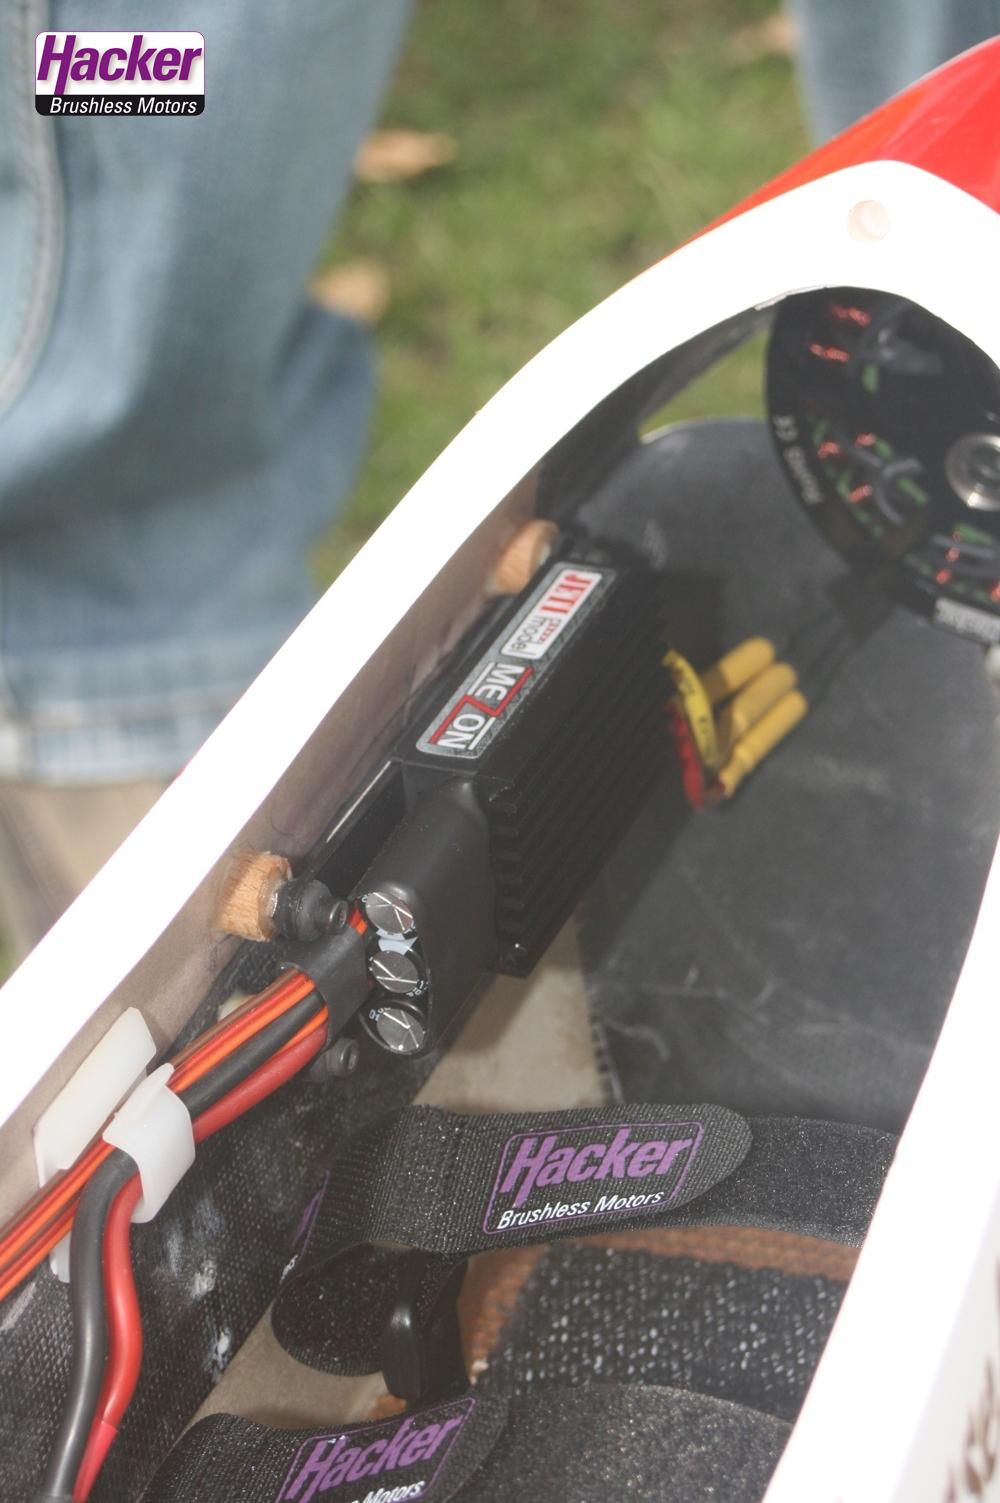 hacker_henning_wessels_2_1000